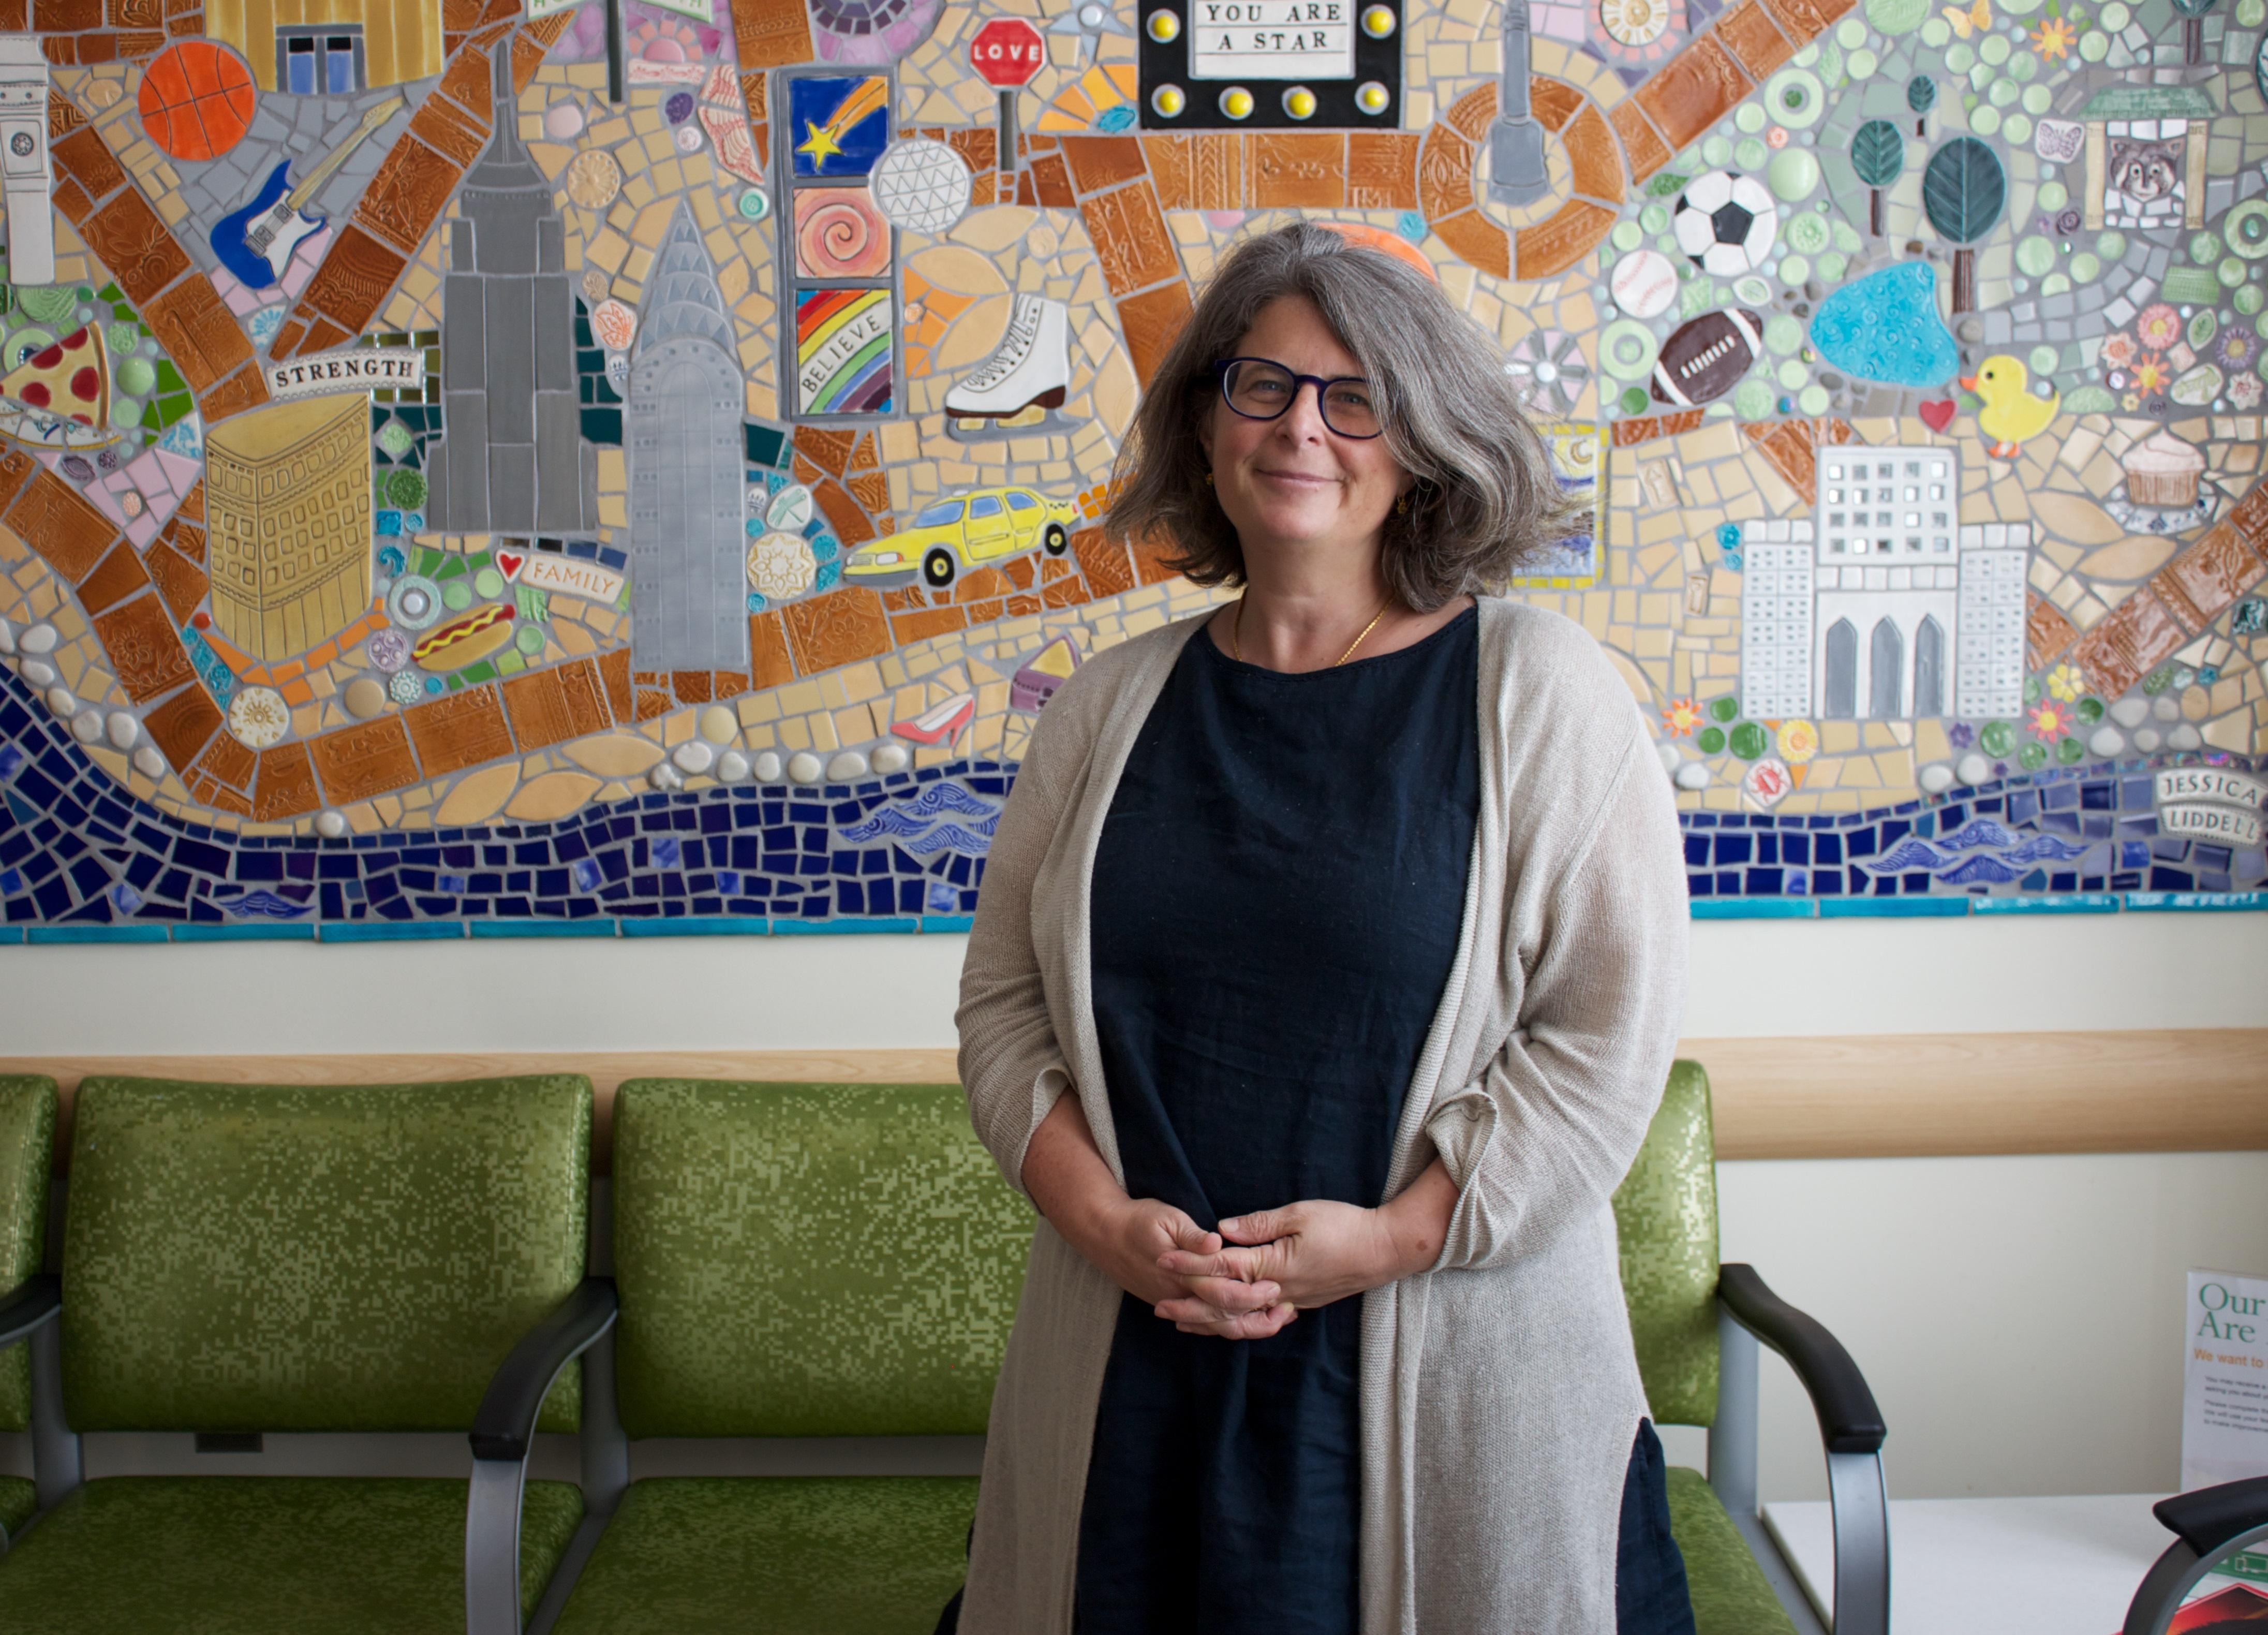 Dr. Jennifer M. Levine